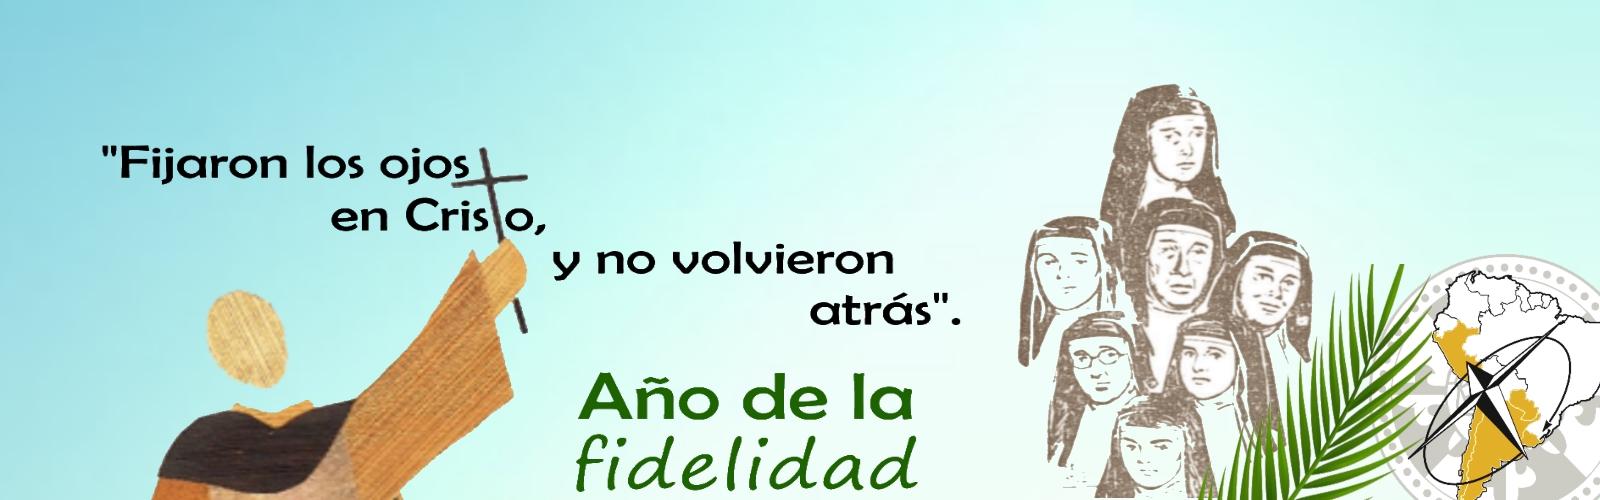 anio_fidelidad